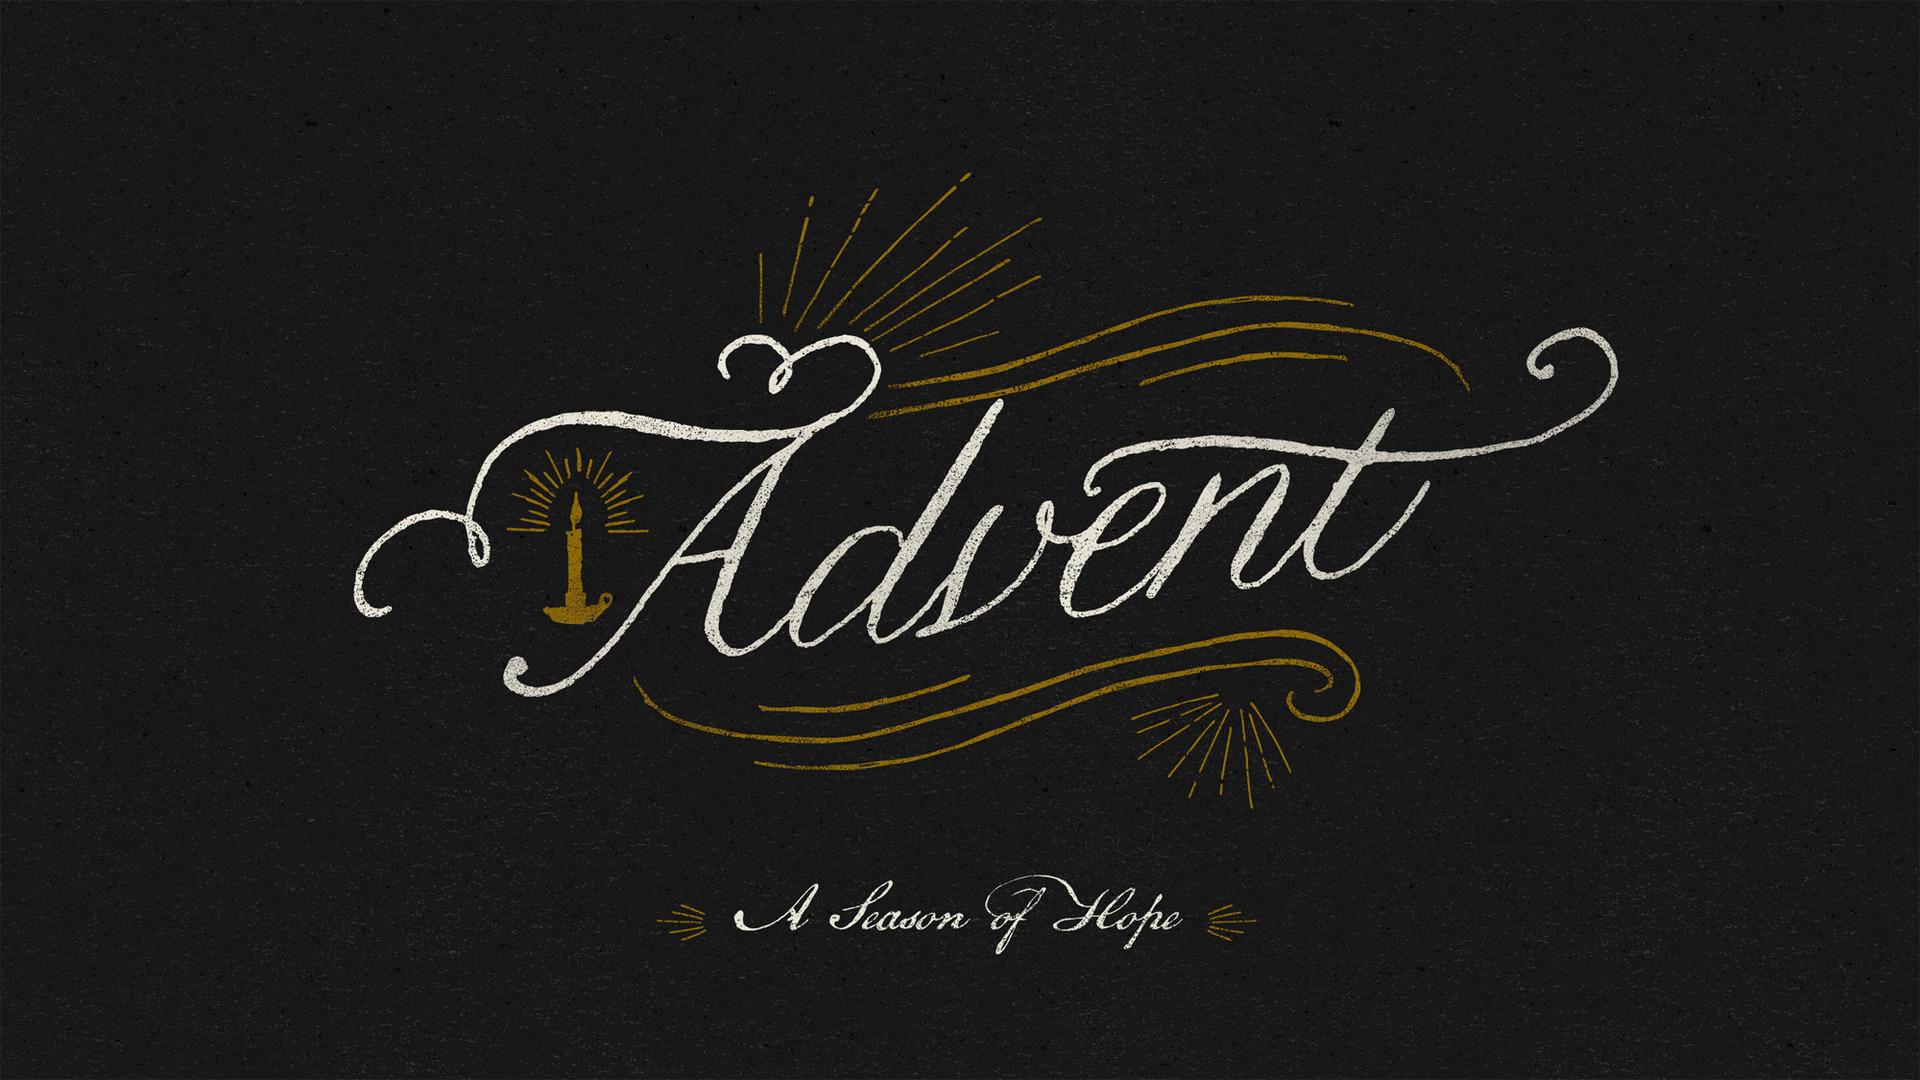 advent-title-1-still-16x9.jpg